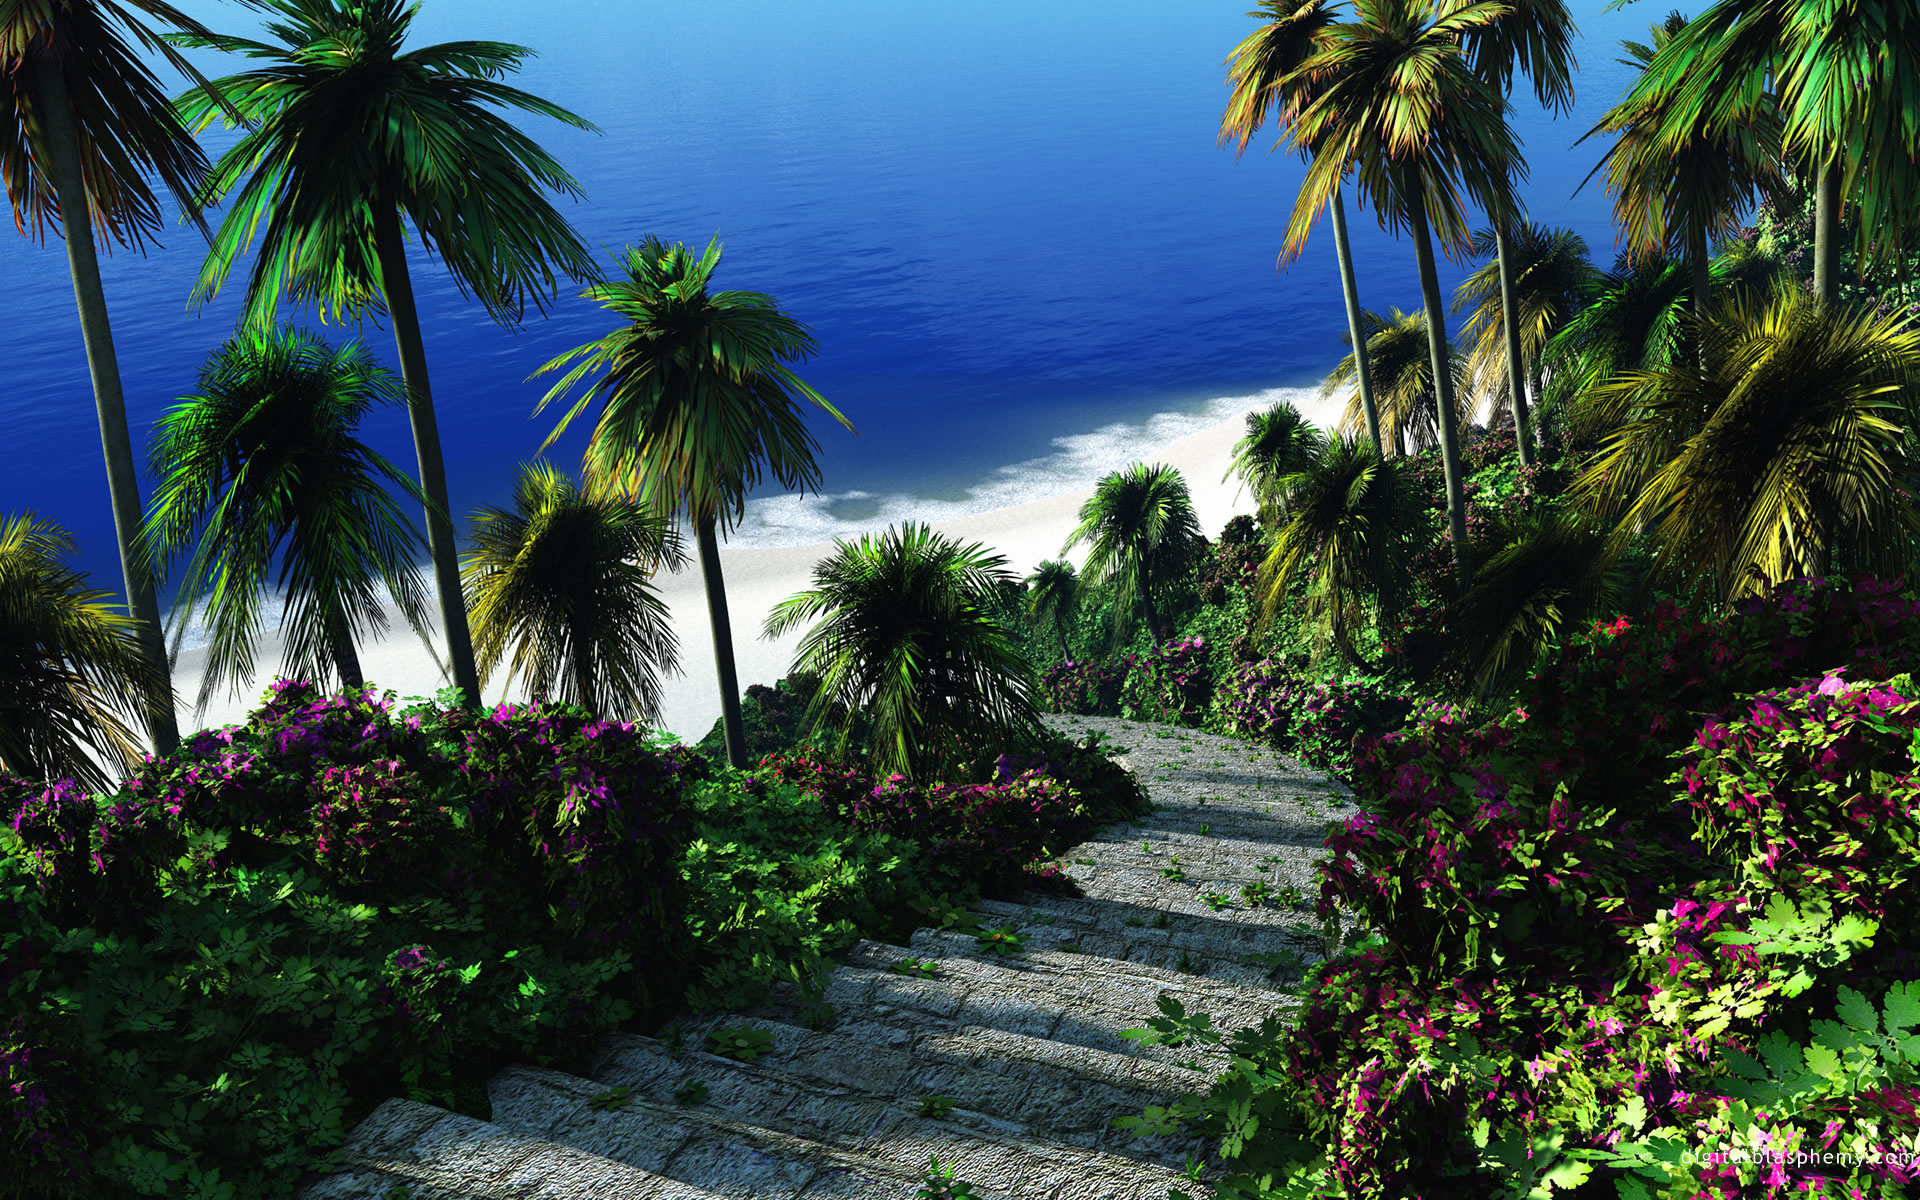 Camino a la Playa.